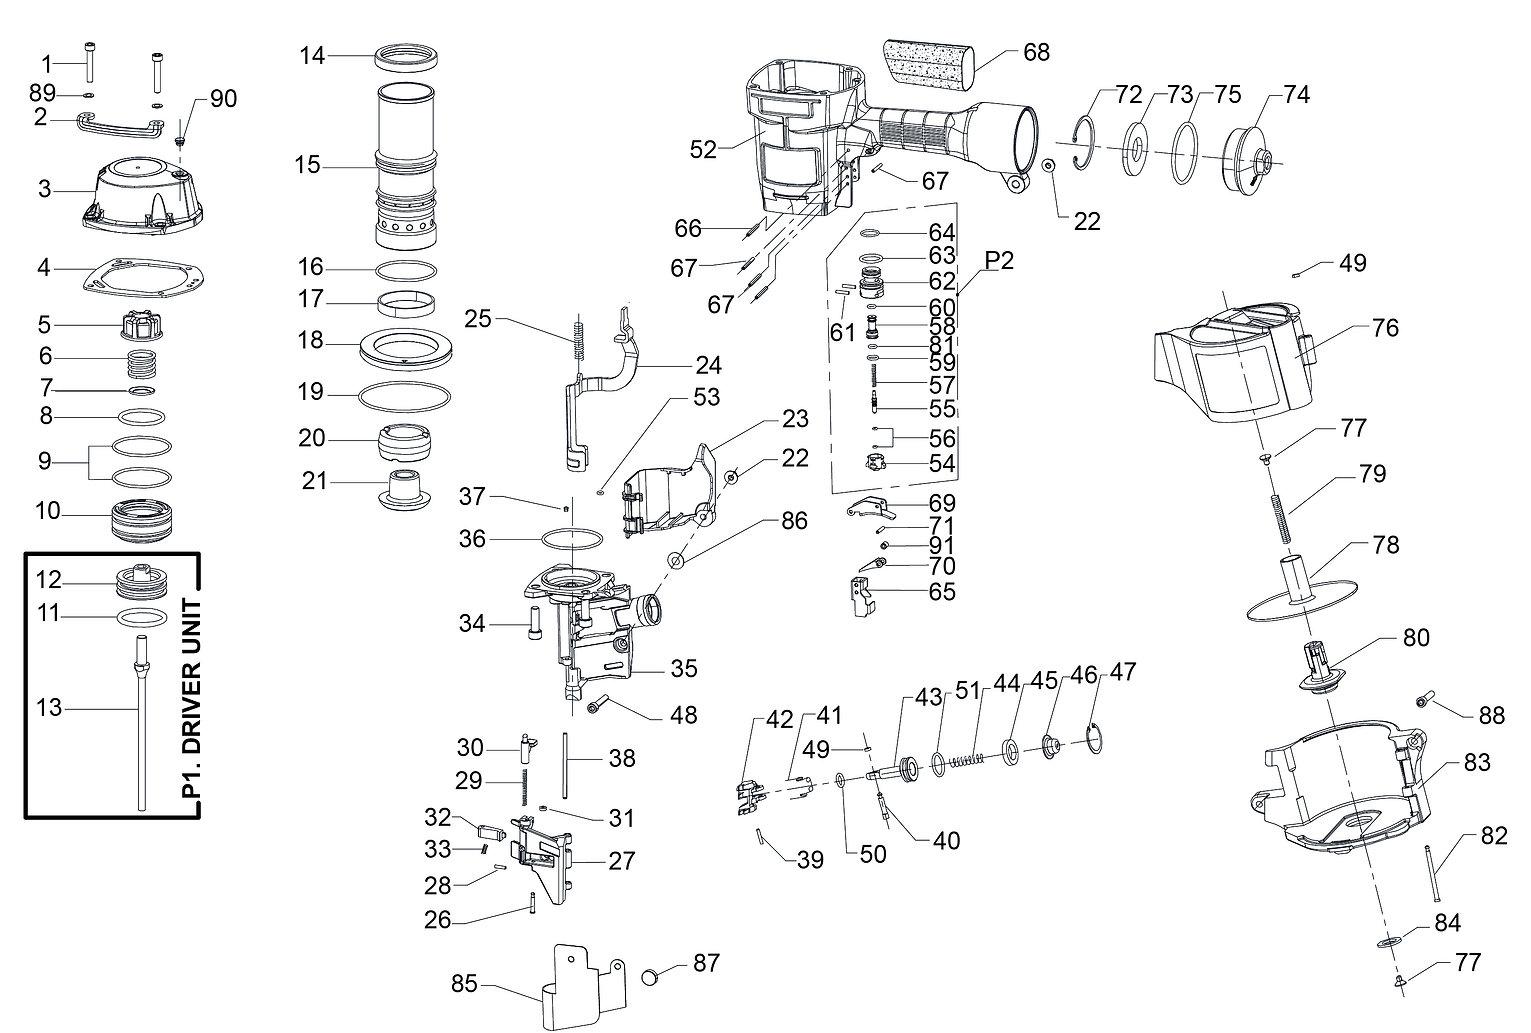 Diagrama Herramienta TO023-01.jpg